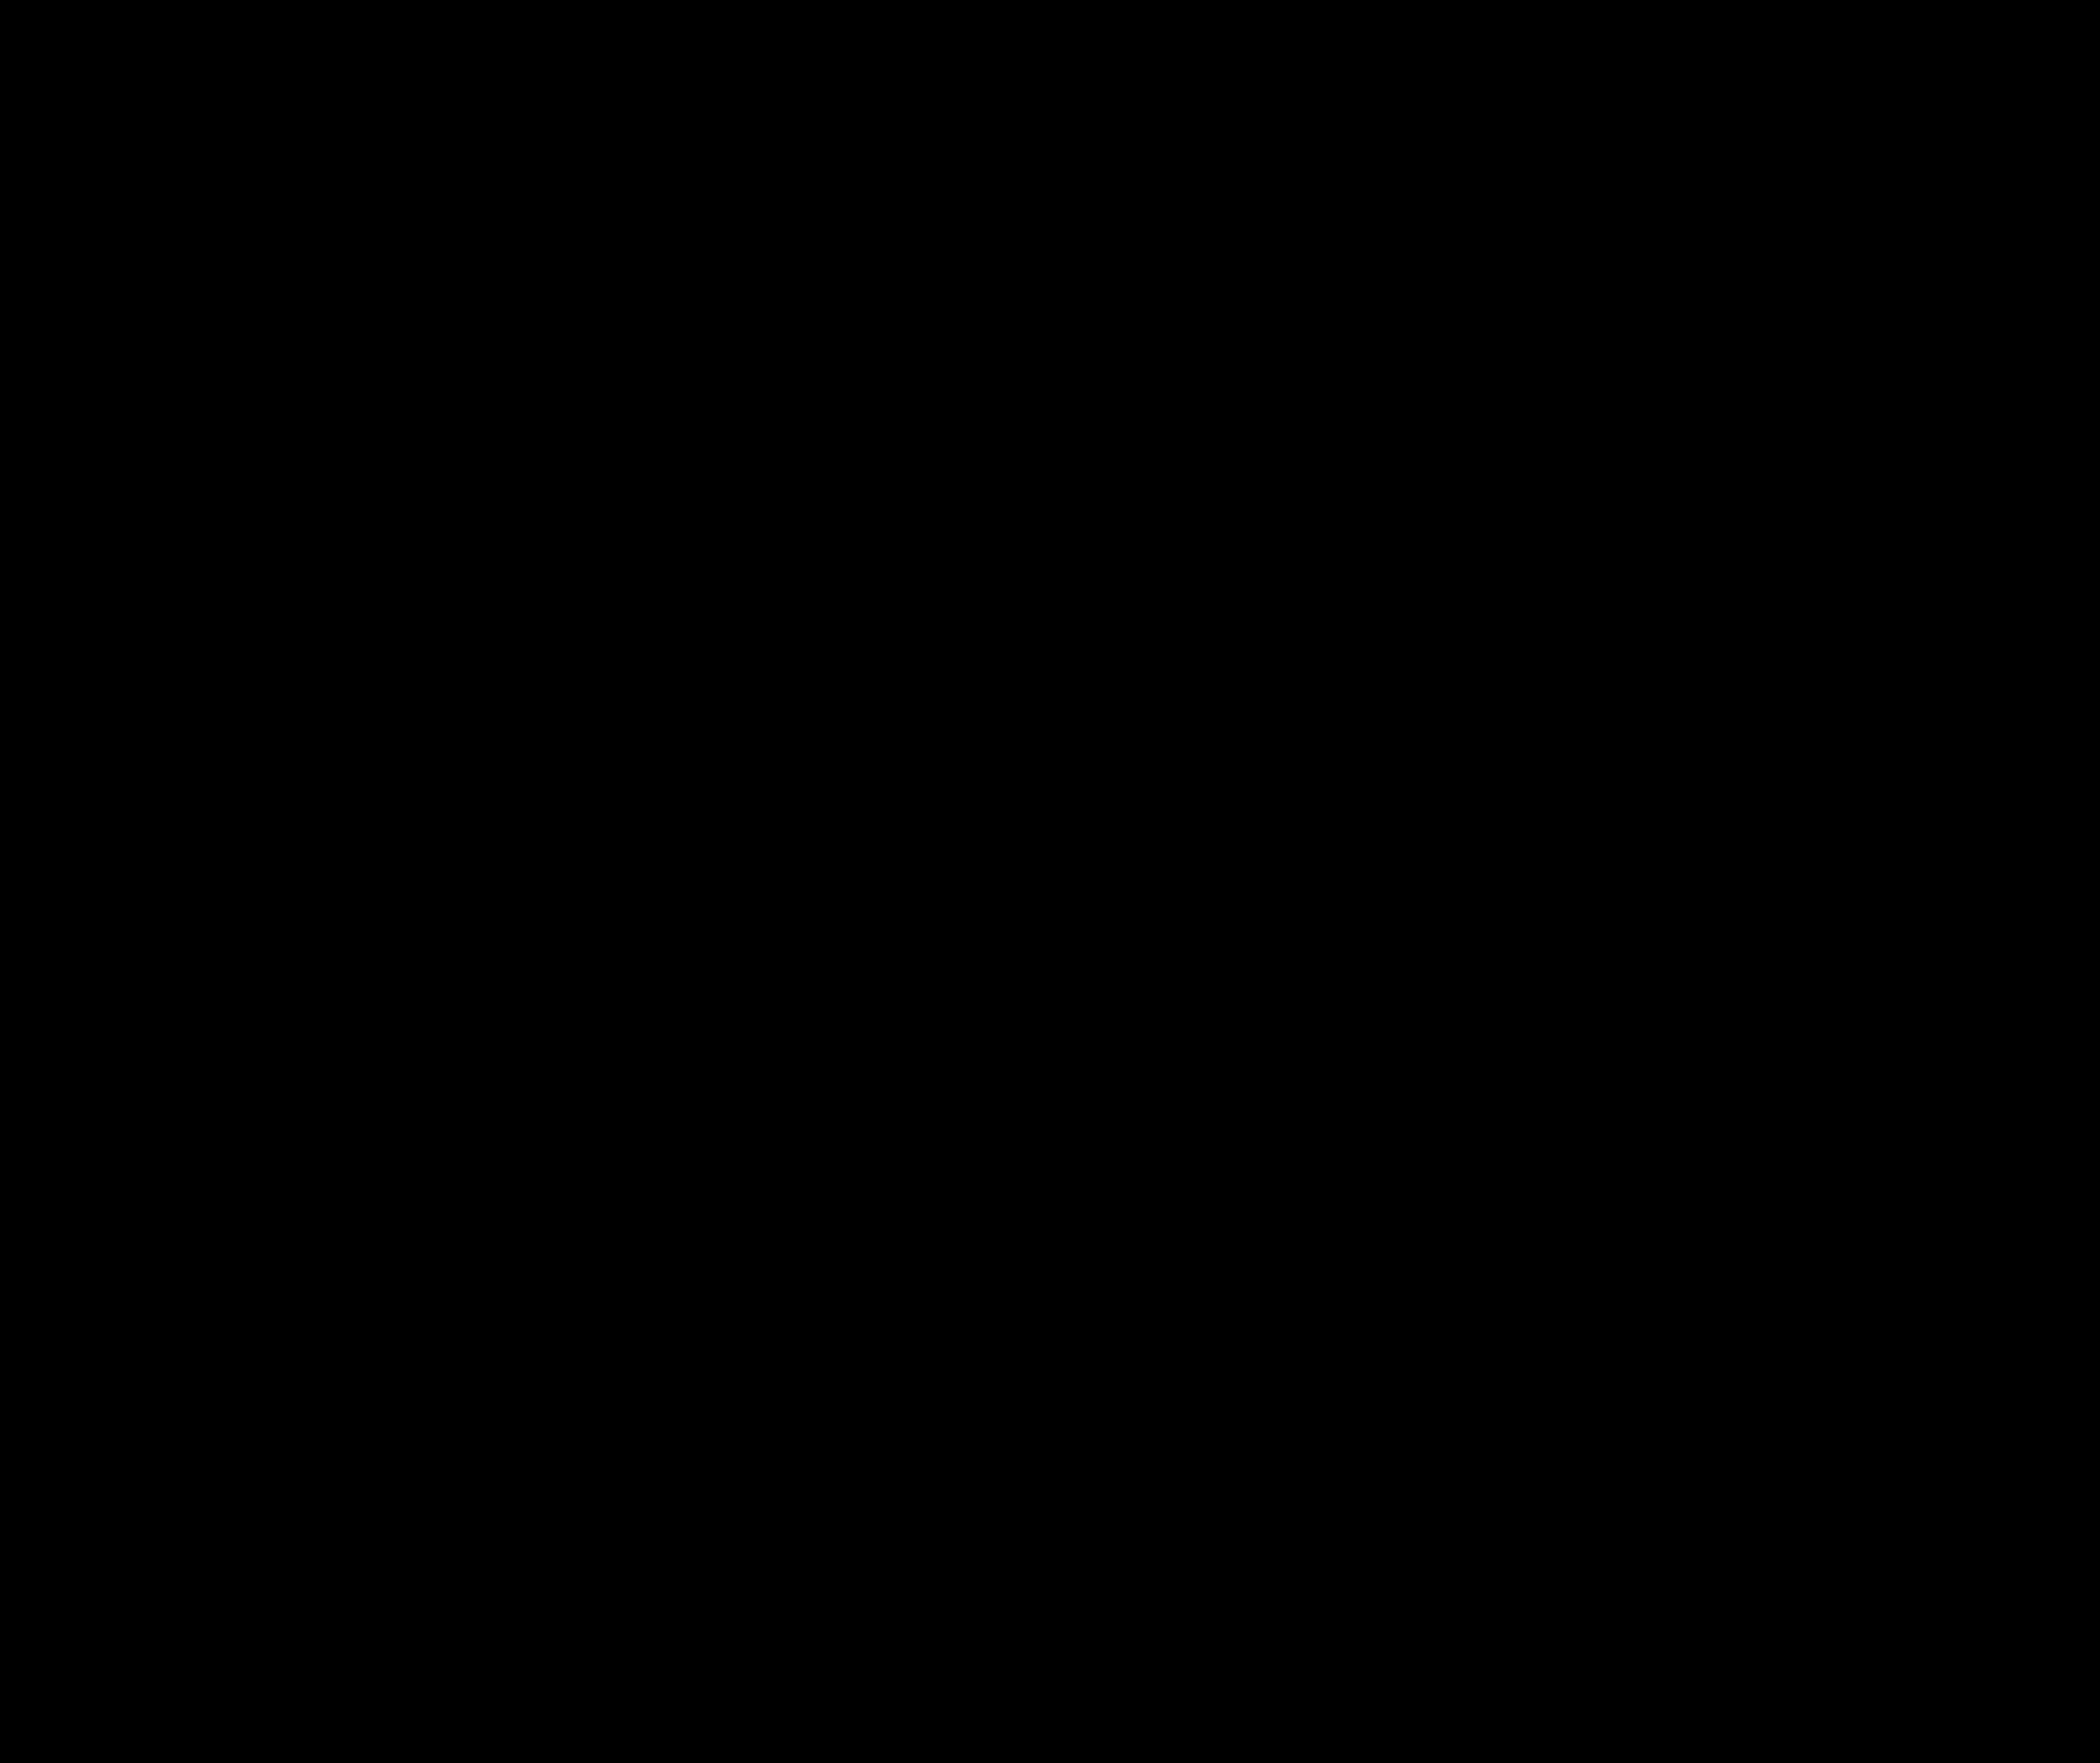 Bicycle bike icon big. Biking clipart symbol